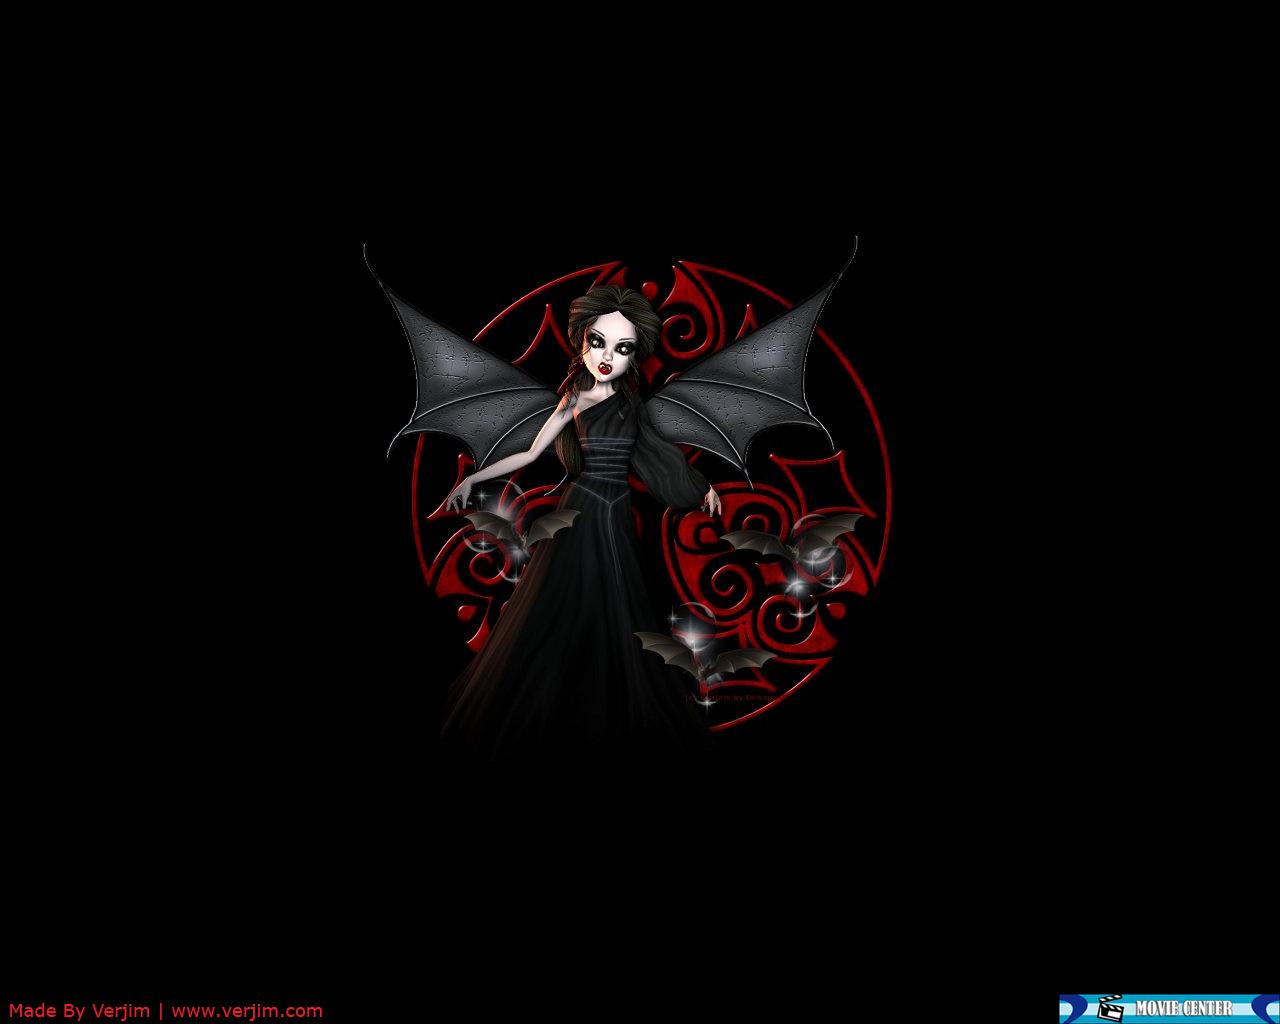 http://3.bp.blogspot.com/-HA1Z8Sz7qc8/T4hJD2W53hI/AAAAAAAAAOA/mYOFkL6wppA/s1600/gothic-art-wallpaper-blogspot.com.jpg